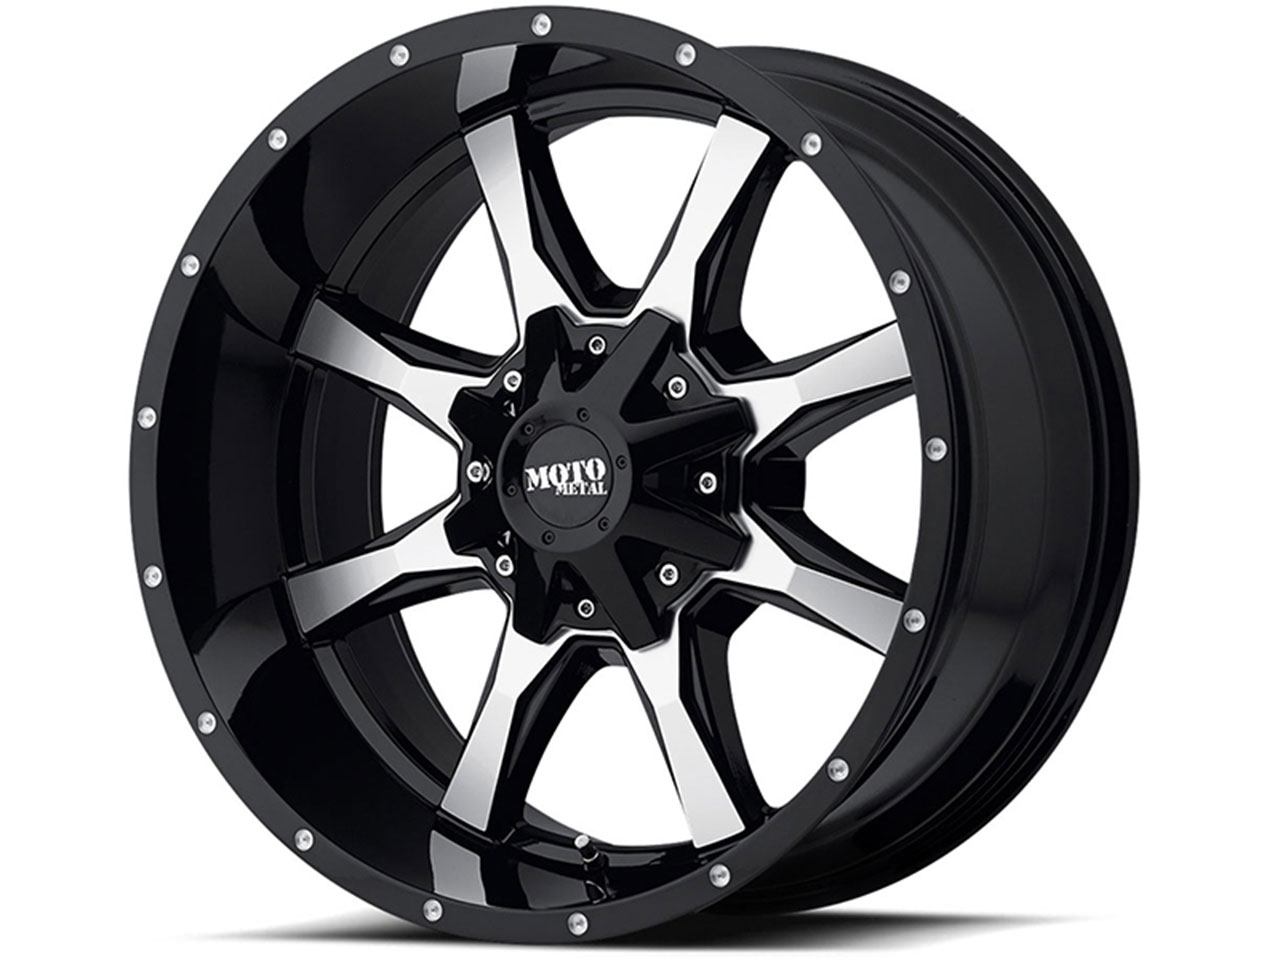 Truck Wheels Truck Rims Wheel Tire Combos Realtruck